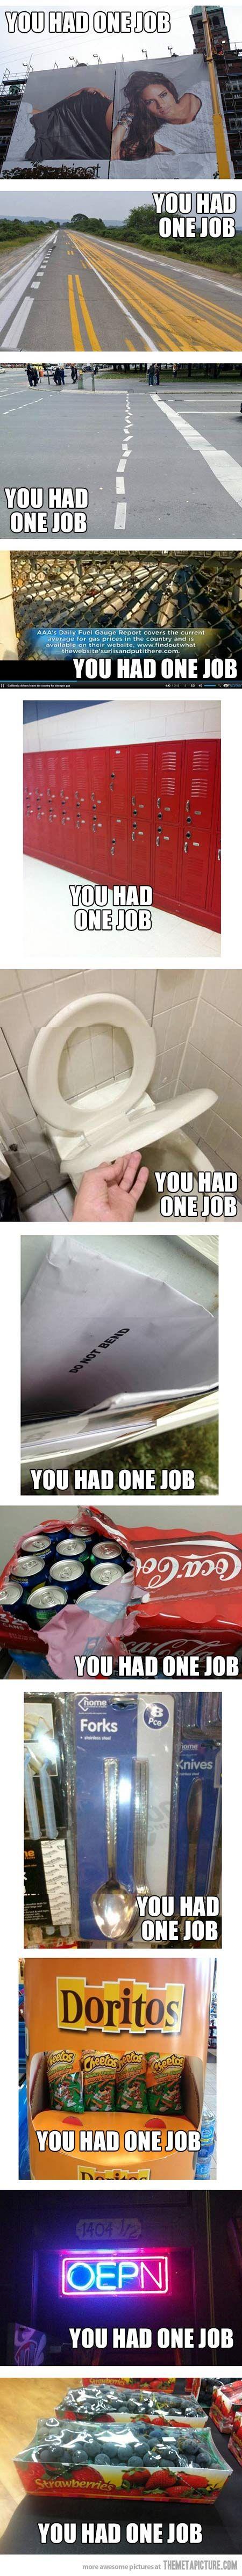 """You had one job"""